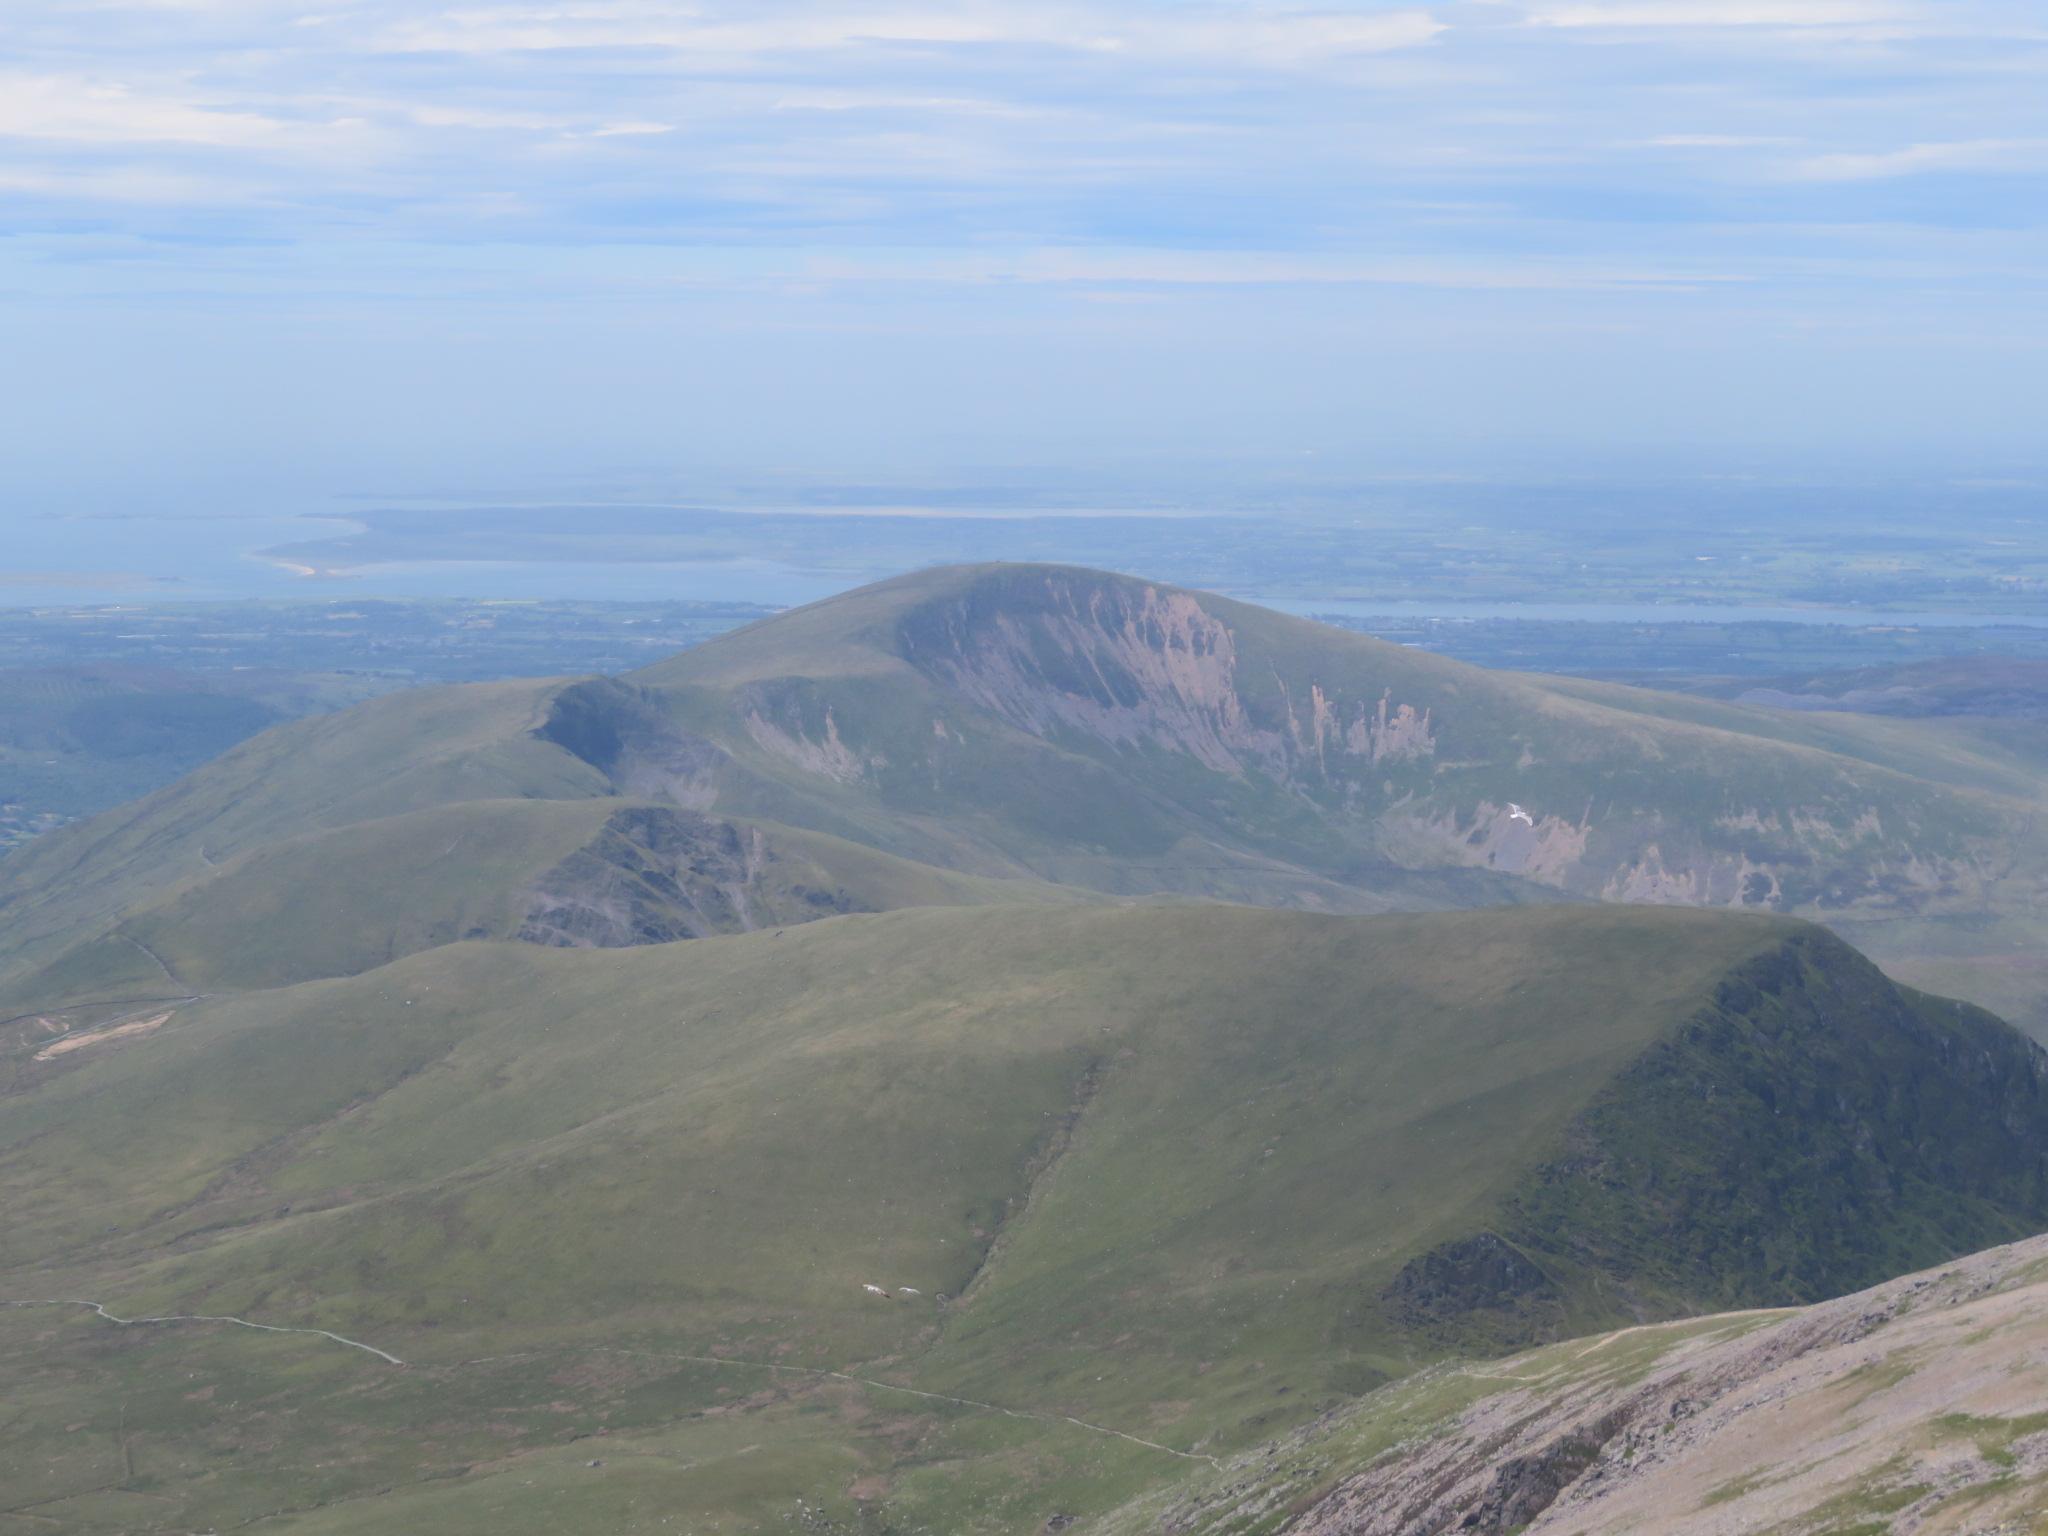 United Kingdom Wales Snowdonia, Snowdon Horseshoe, North from summit, Walkopedia